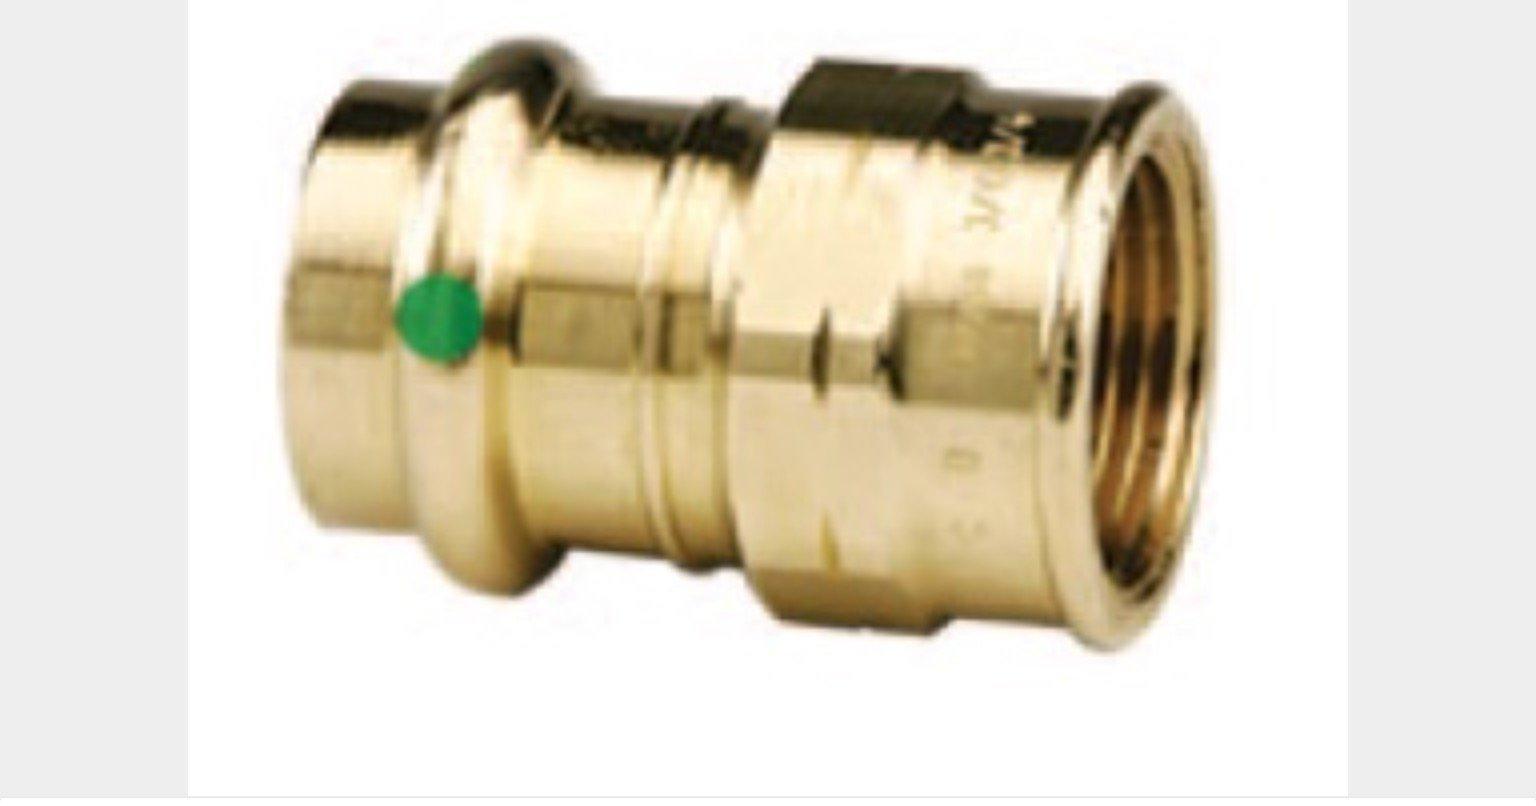 VIEGA 79300 Propress Zero Lead Bronze Adapter with Female 1/2'' x 1/2'' P x Female NPT (5-Pack)